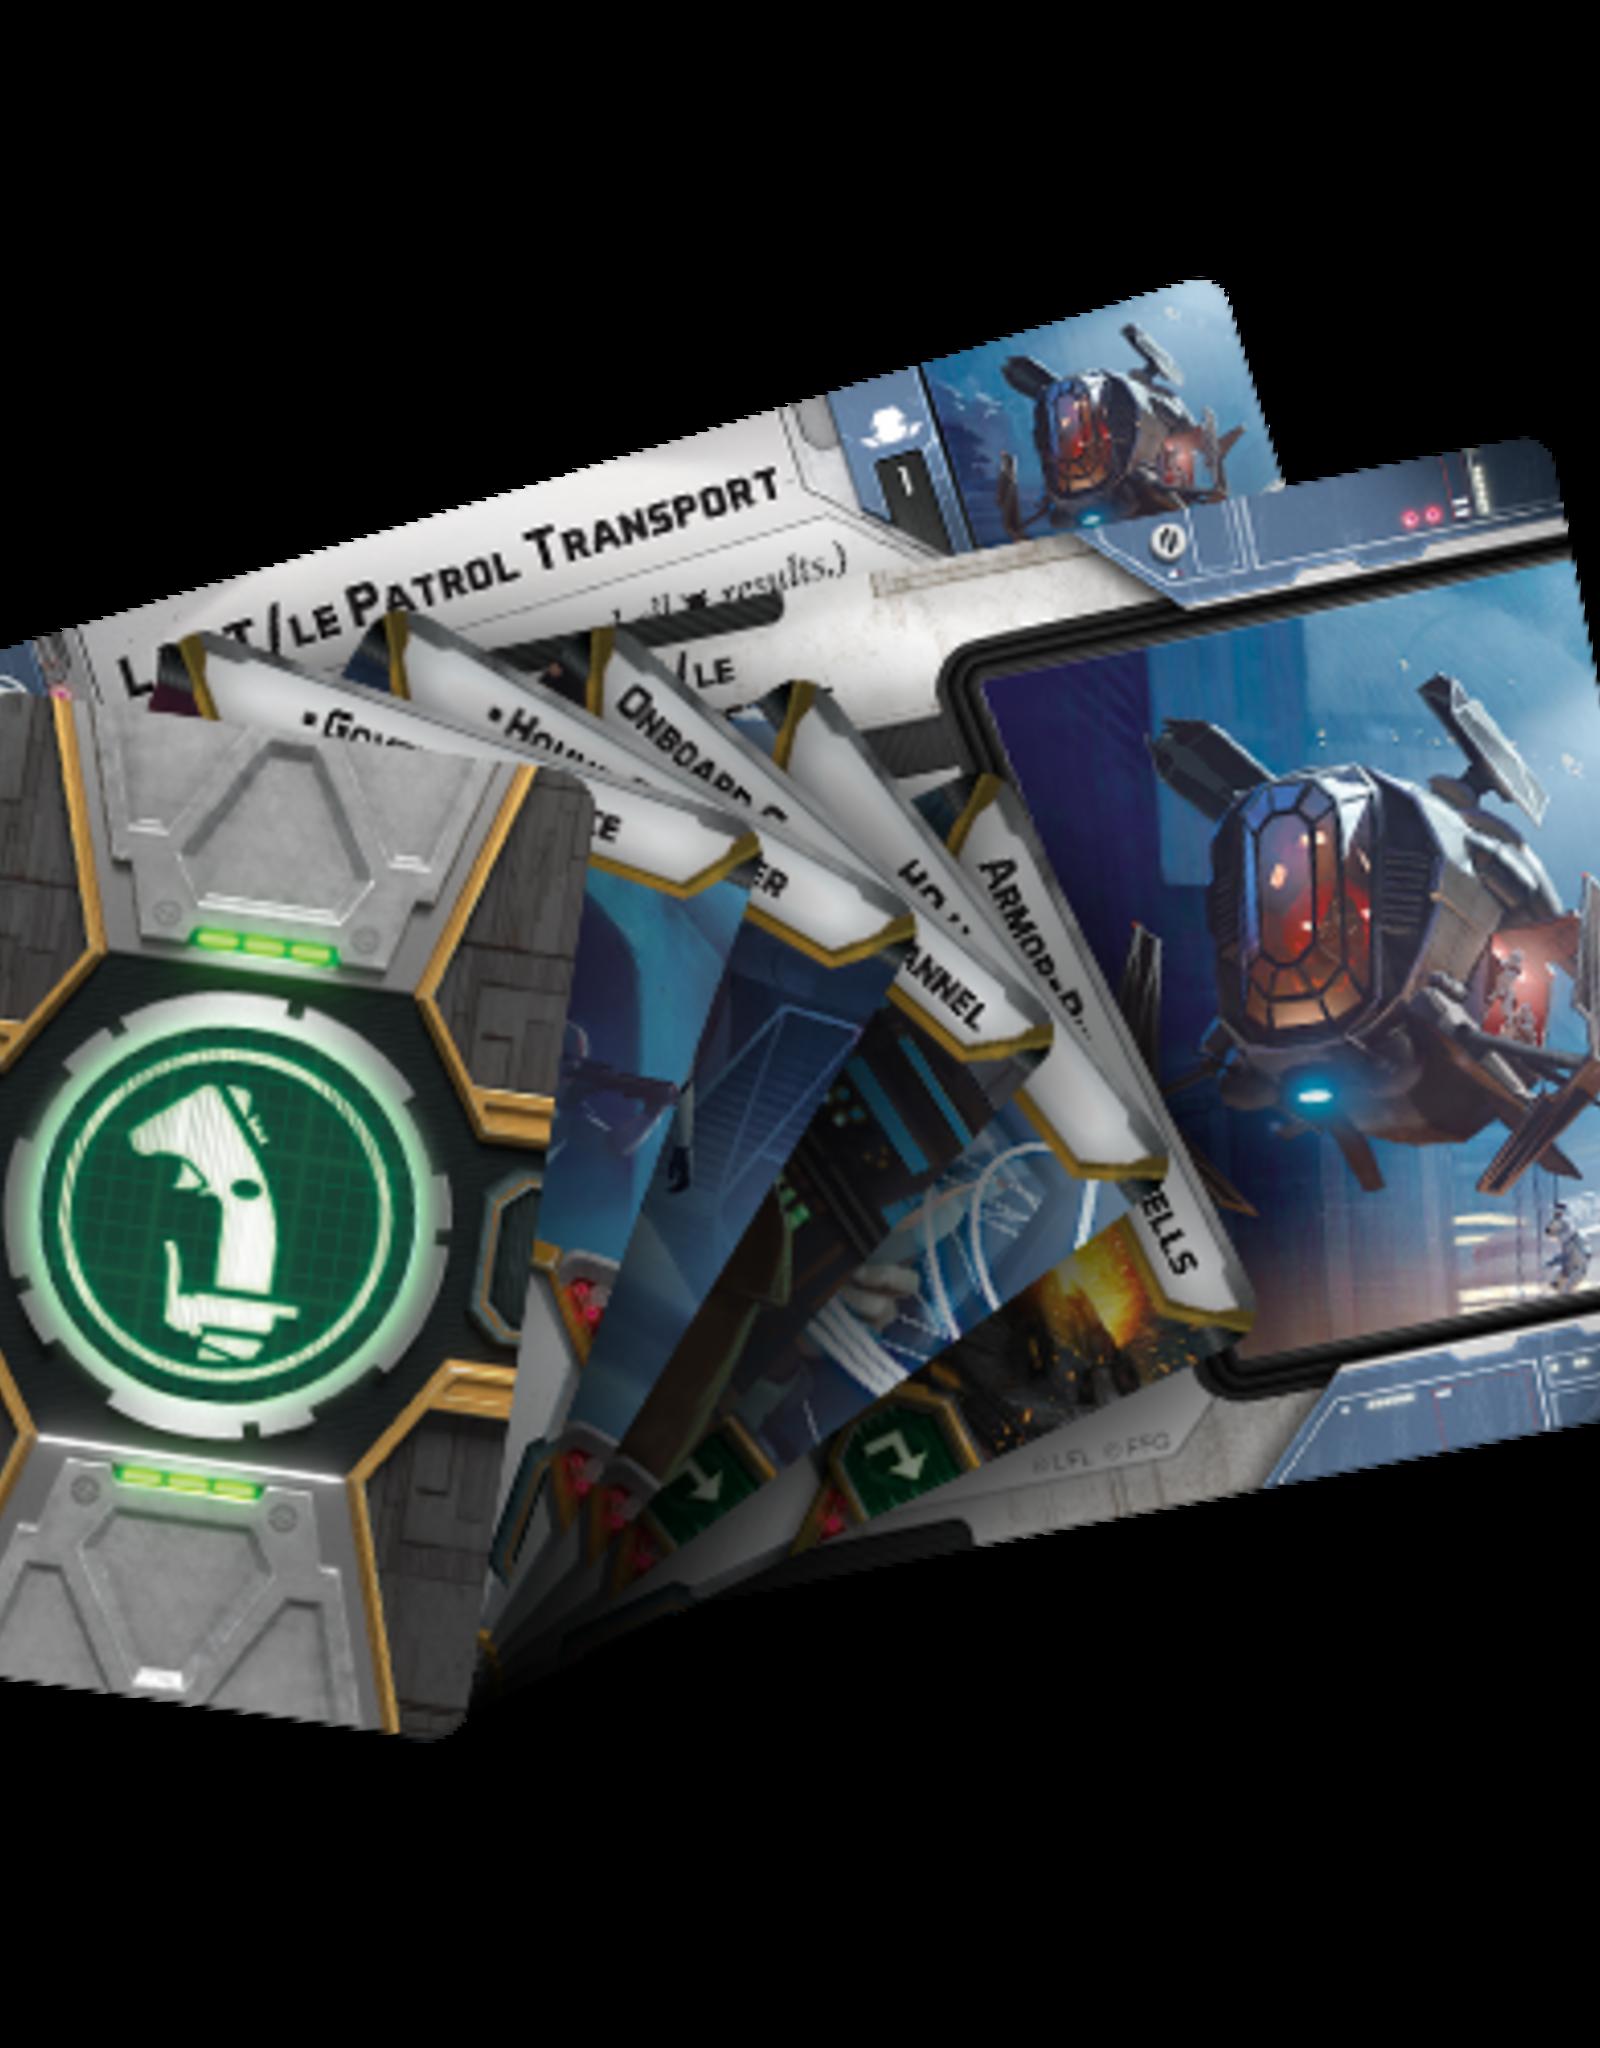 FFG Star Wars: Legion - LAAT/le Patrol Transport Expansion